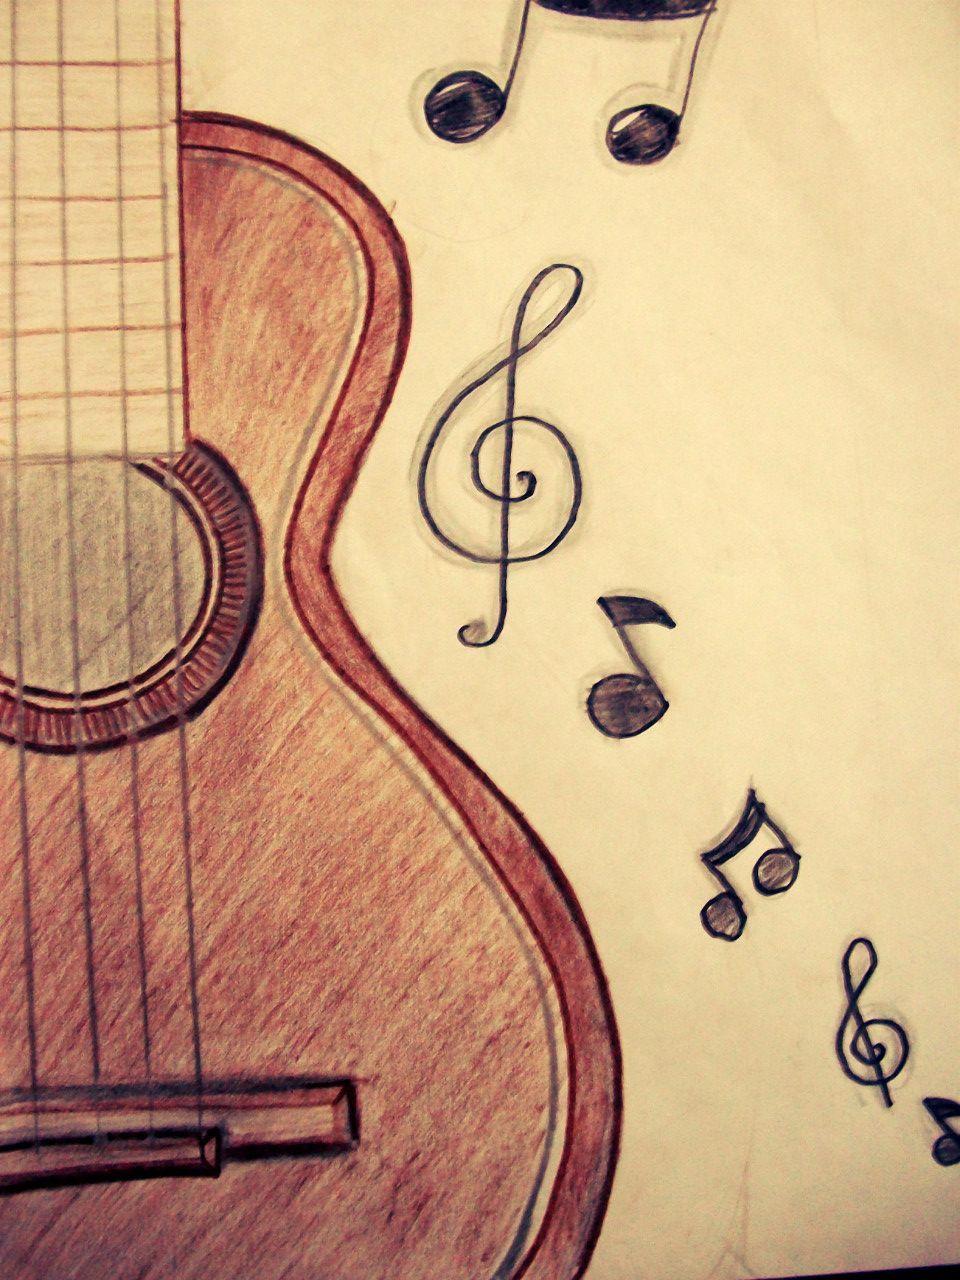 Resultado De Imagen Para Dibujo De Guitarra A Lapiz Dibujos Geniales De Arte Dibujos De Guitarras Boceto De Dibujo